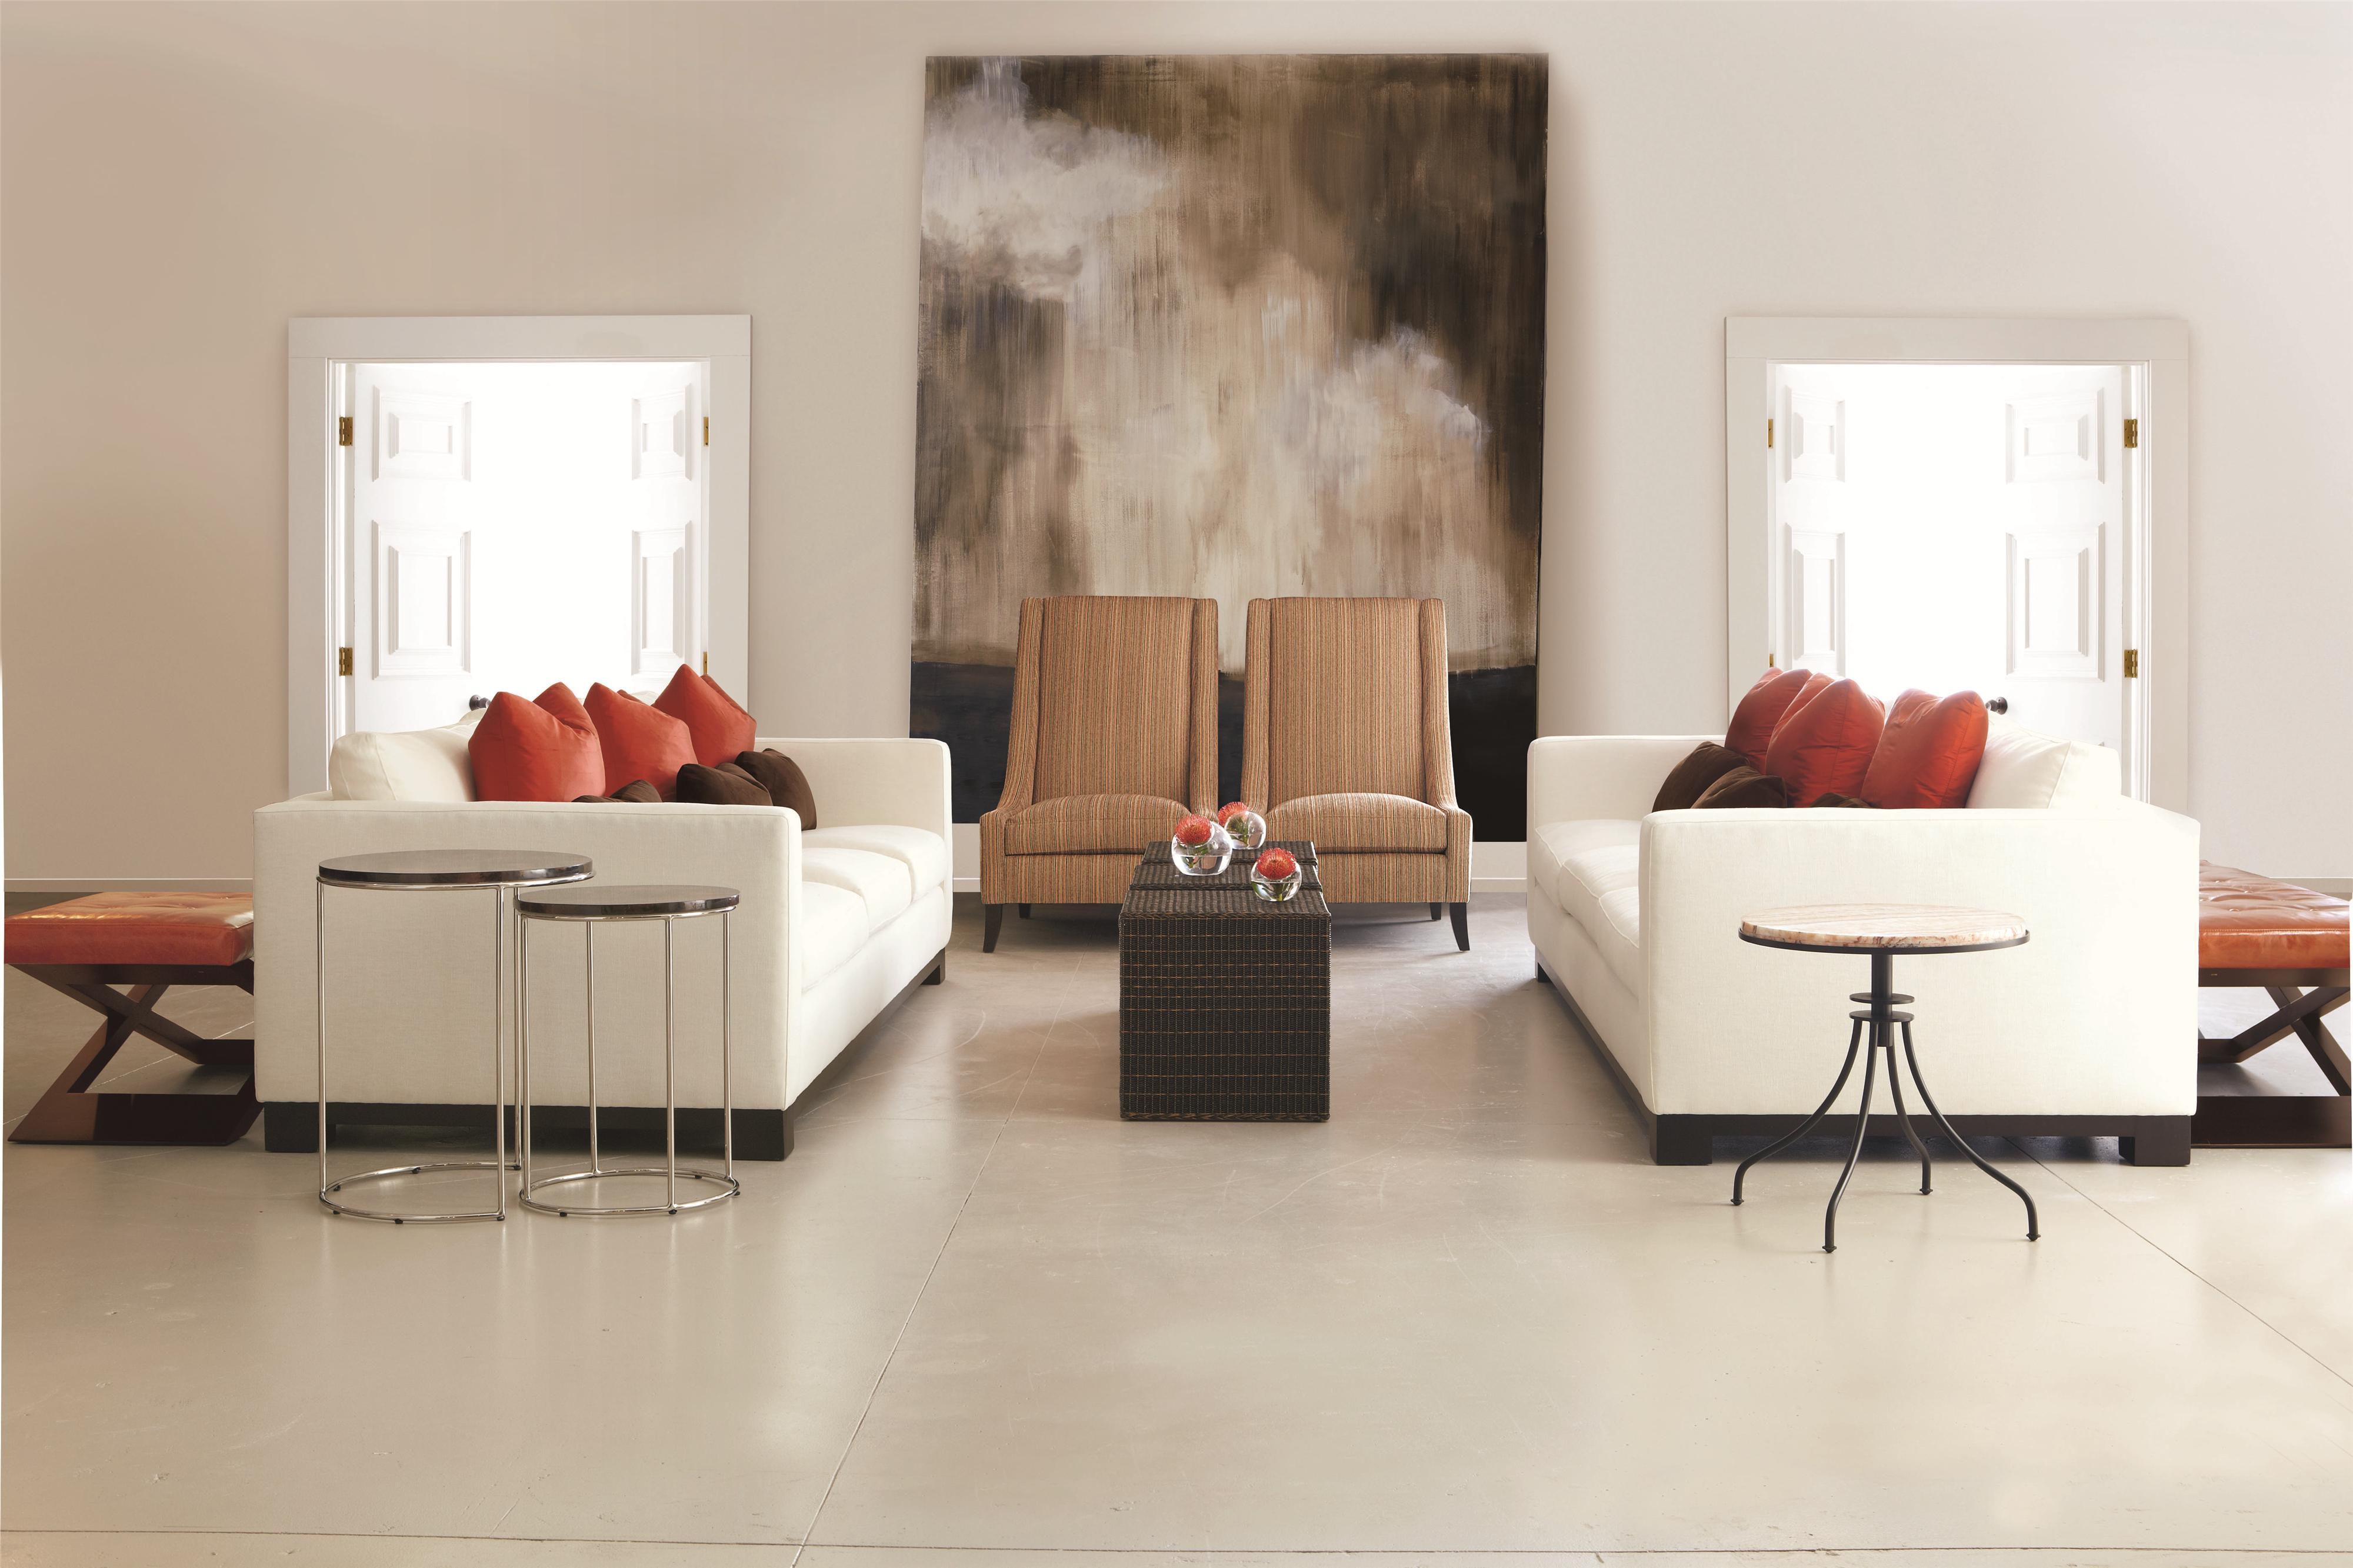 bernhardt living room furniture. Bernhardt Lanai Modern Styled Sofa with Slight Asian Influence in Standard  Size Sprintz Furniture Nashville Franklin and Greater Tennessee